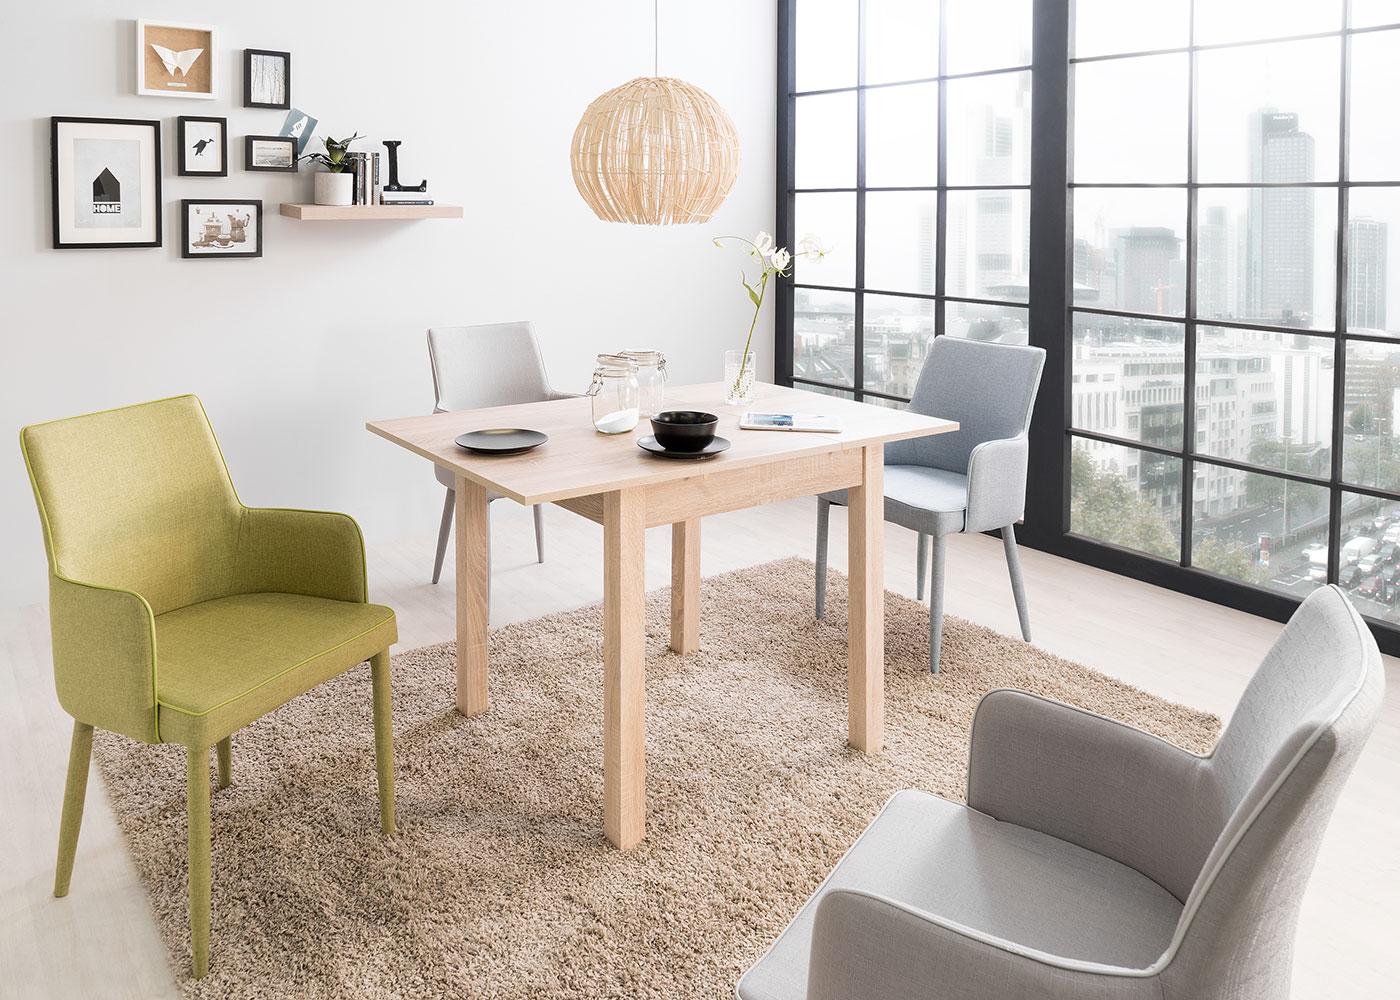 Jedálny stôl rozkladací Kronborg, 120 cm, dub, dub